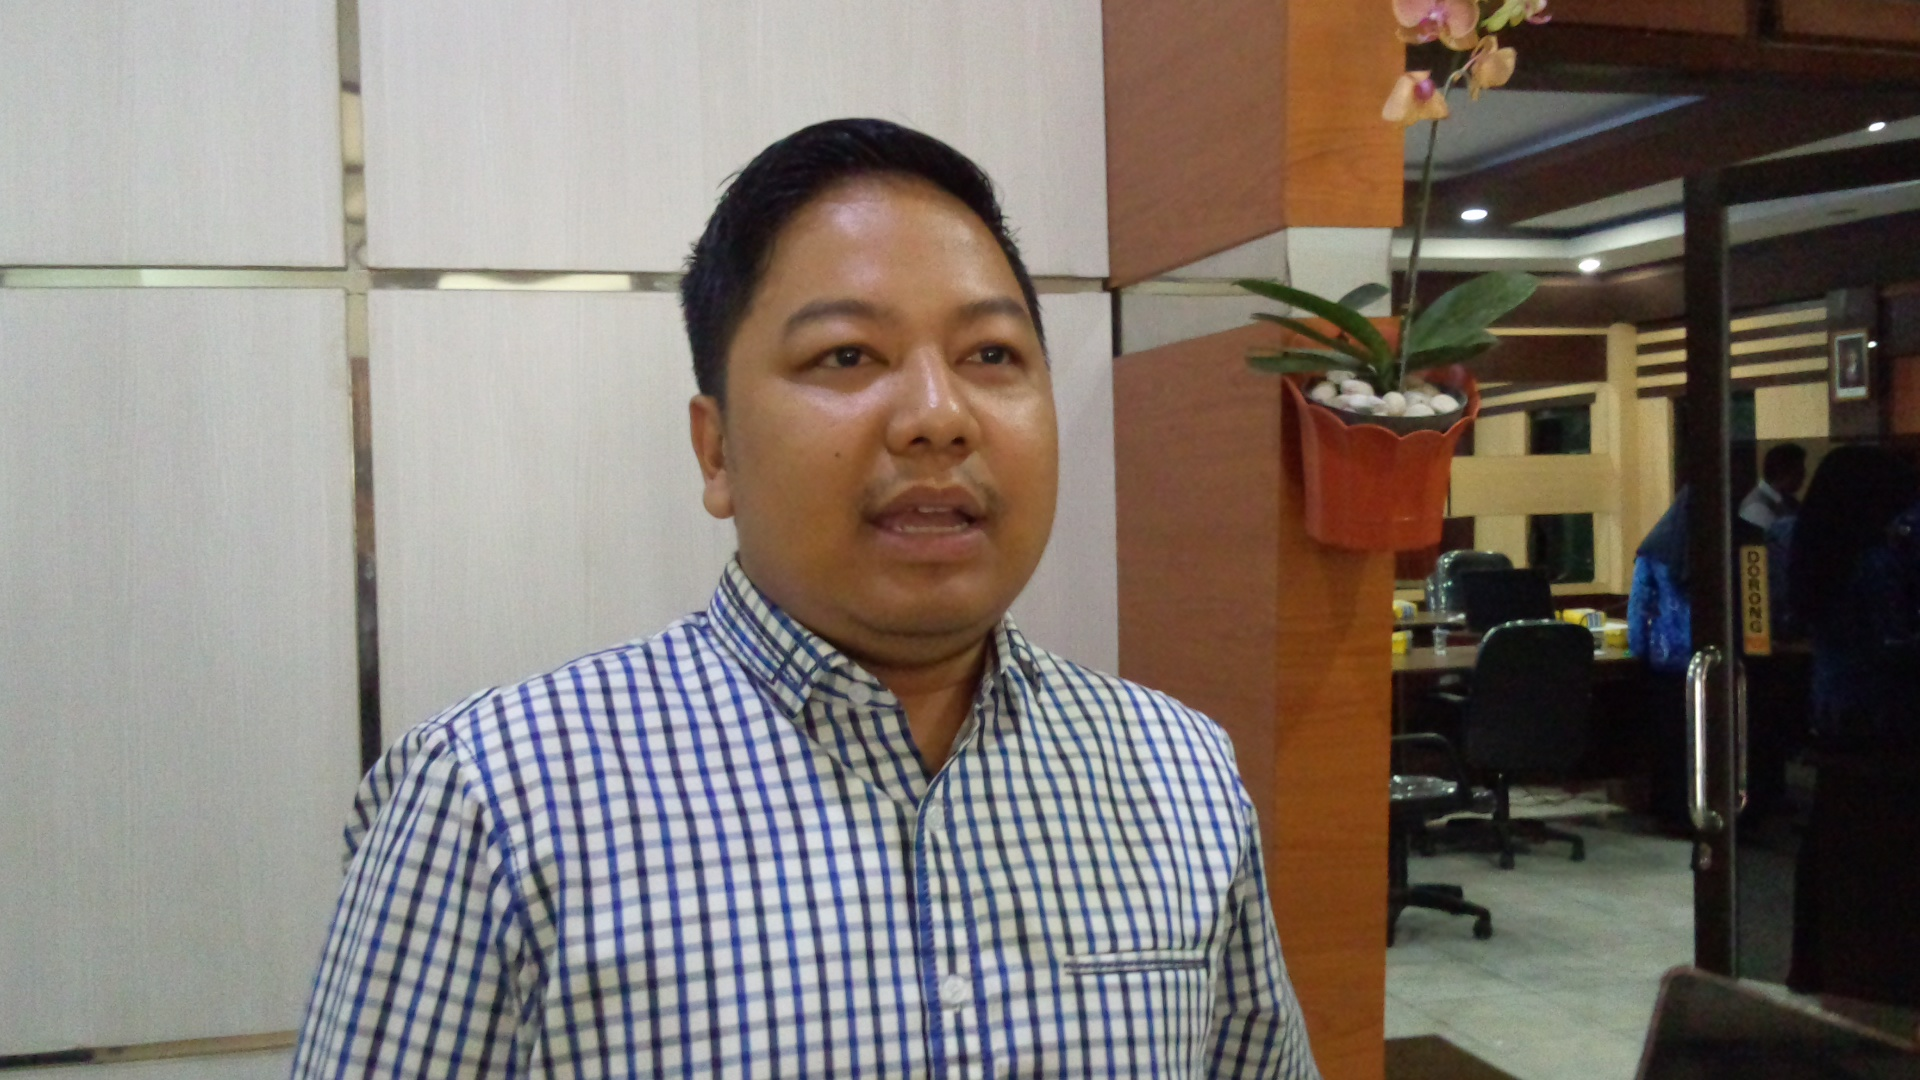 Ketua DPRD Banjar Usulan Penundaan Pilkada Secara Parsial Ke Bawaslu RI 19